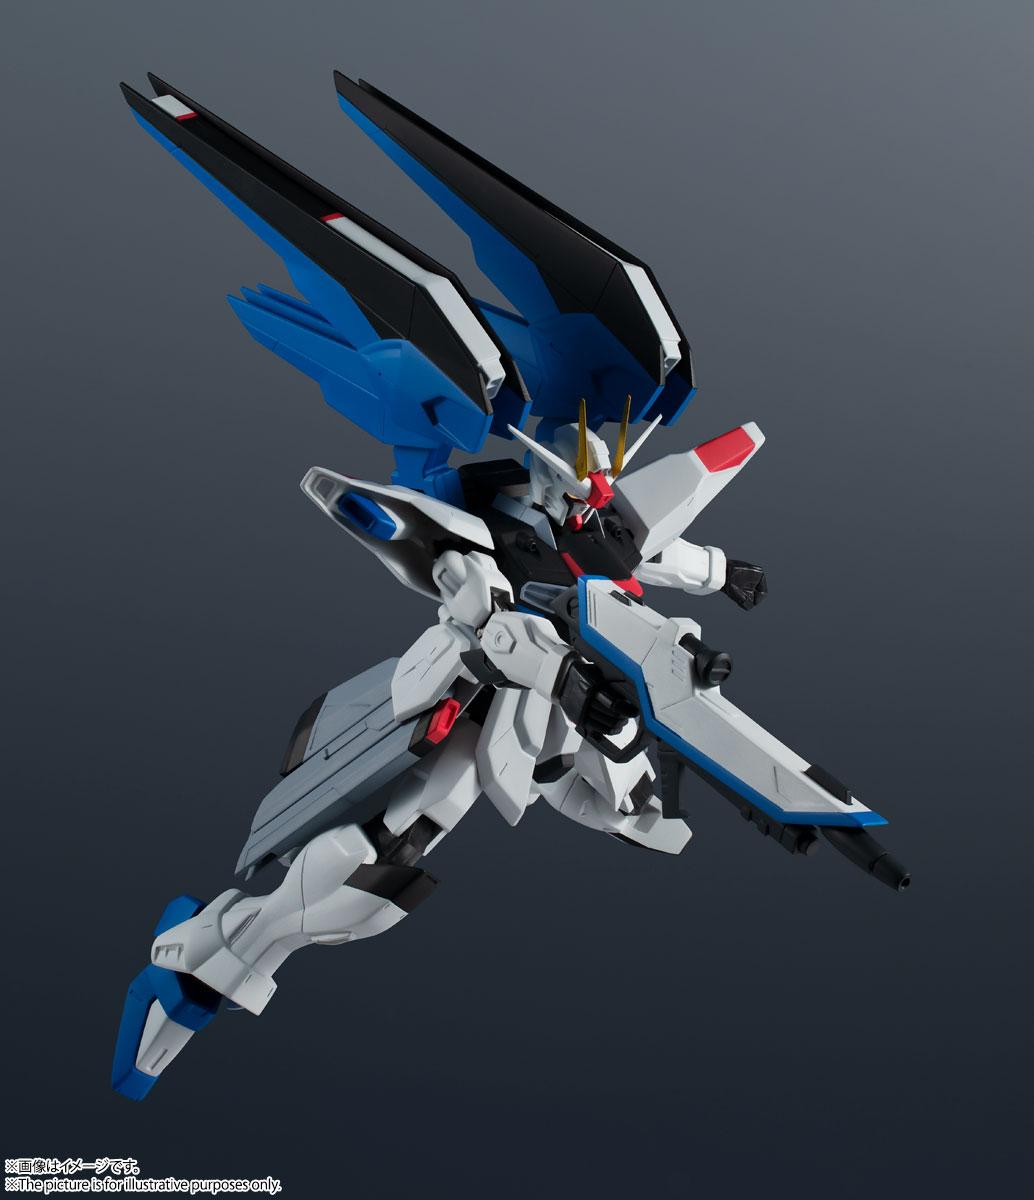 GUNDAM UNIVERSE『GN-001 GUNDAM EXIA/ガンダムエクシア』機動戦士ガンダム00 可動フィギュア-011